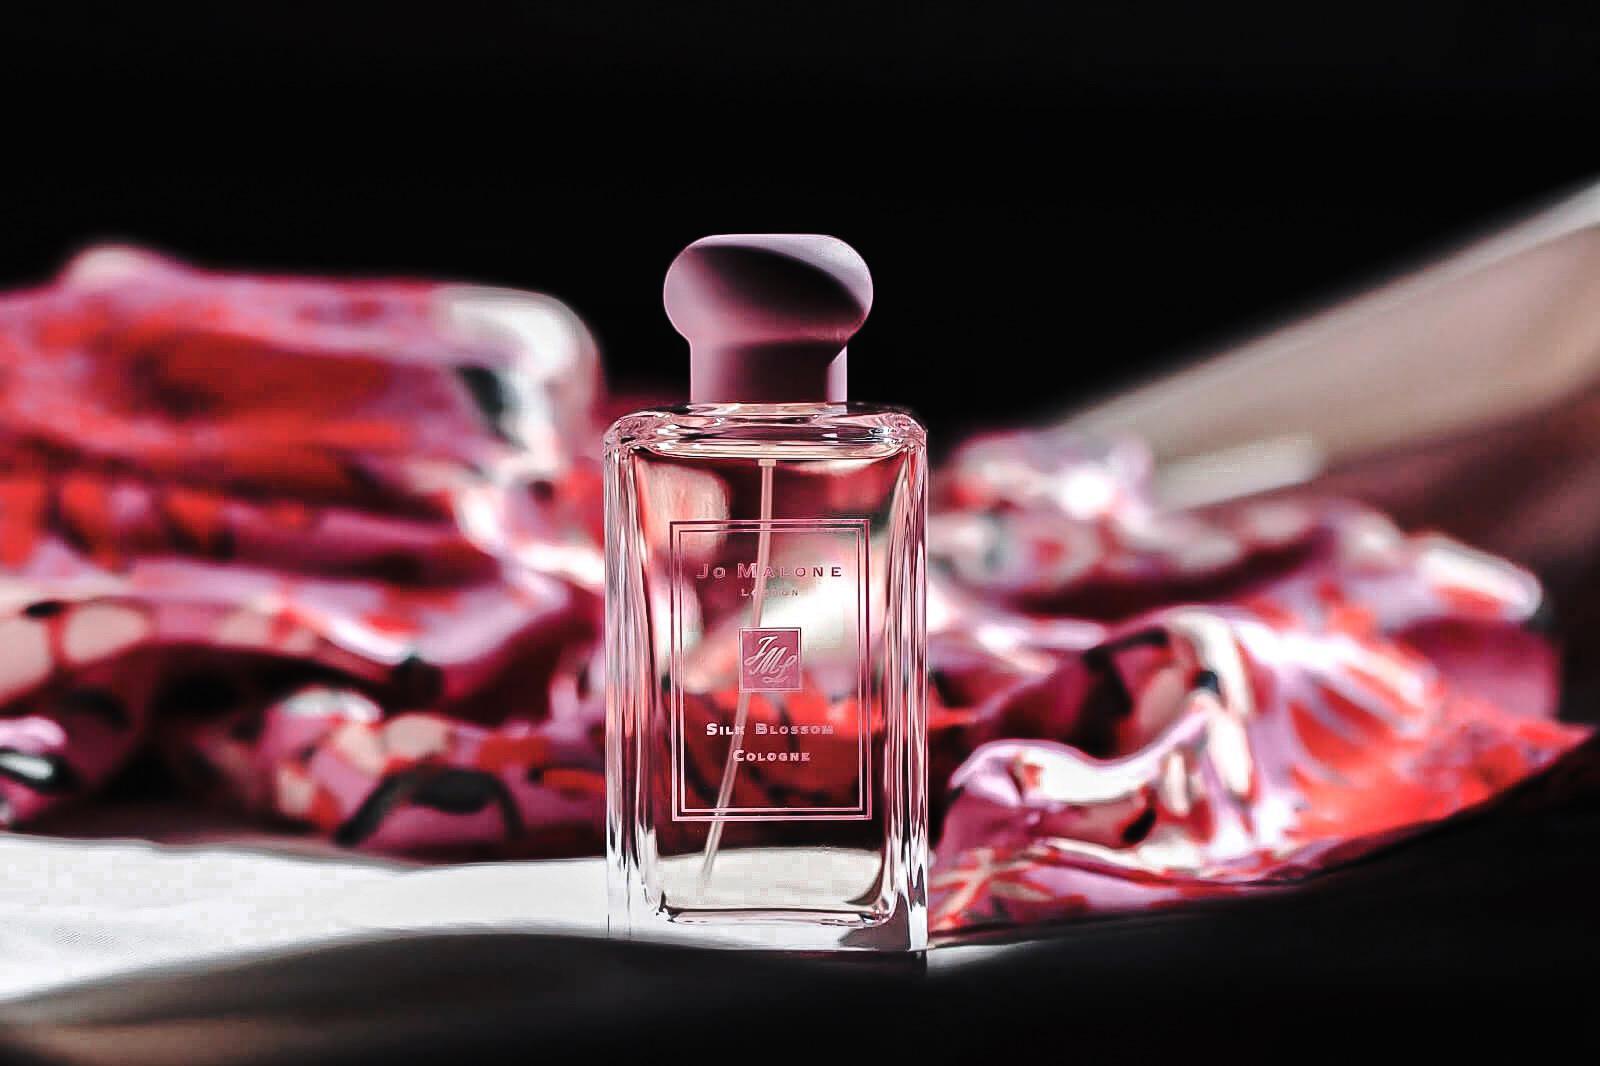 jo-malone-silk-blossom-cologne-parfum-avis-test